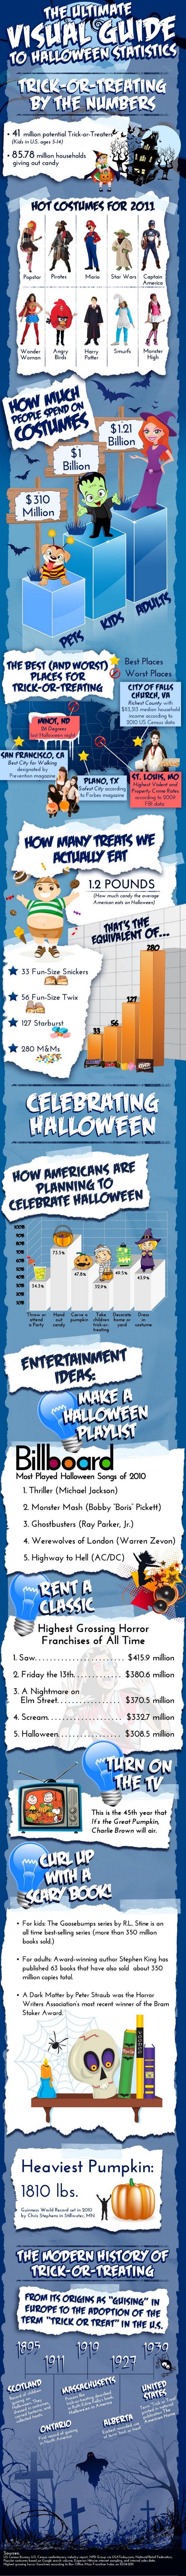 Halloween Statistics